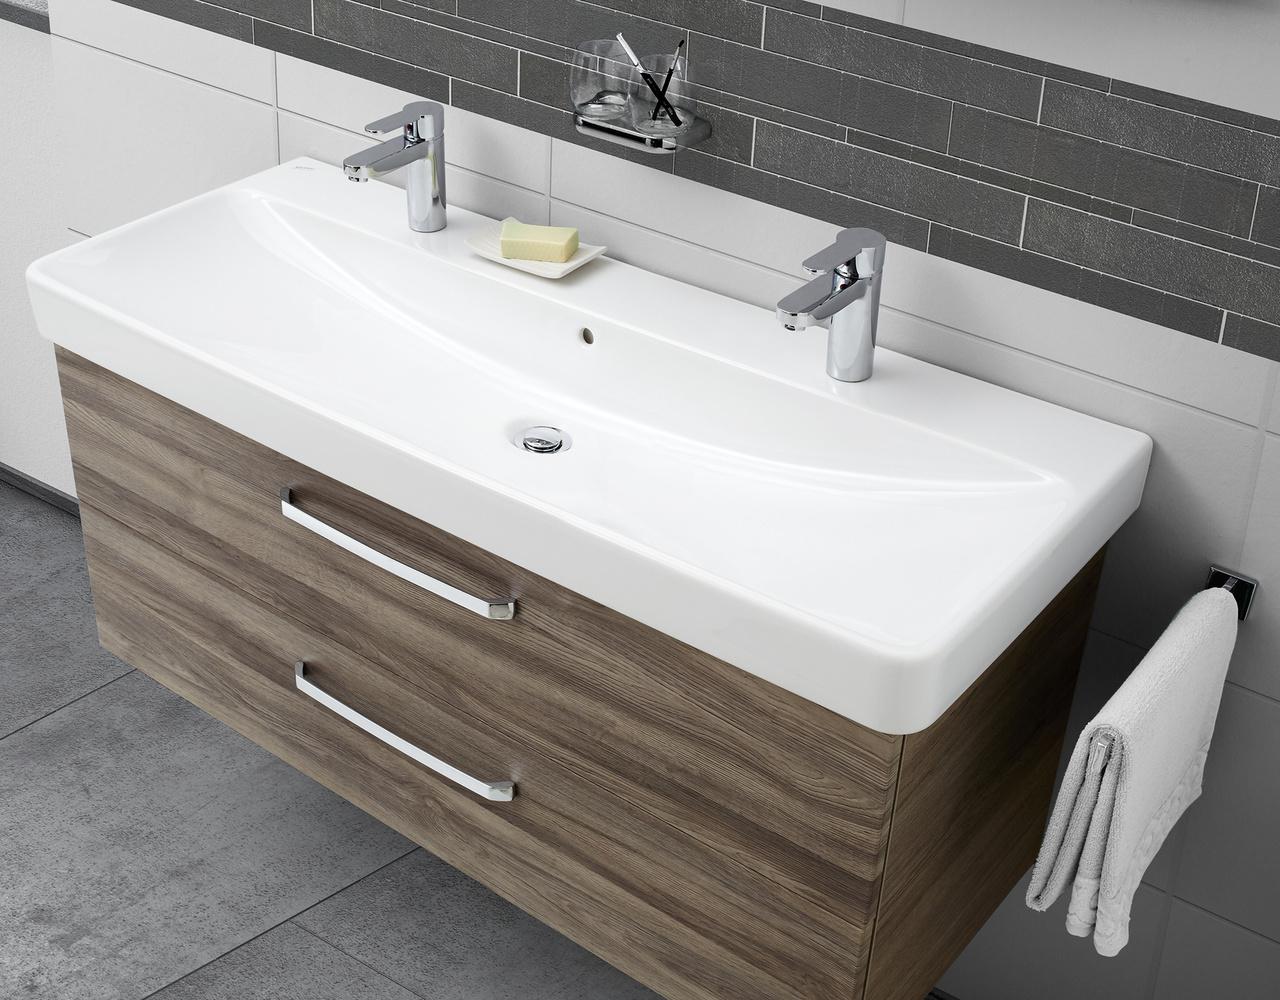 Beliebt Pelipal 9005 Waschtischunterschrank Villeroy & Boch Subway 2.0 10 MS74